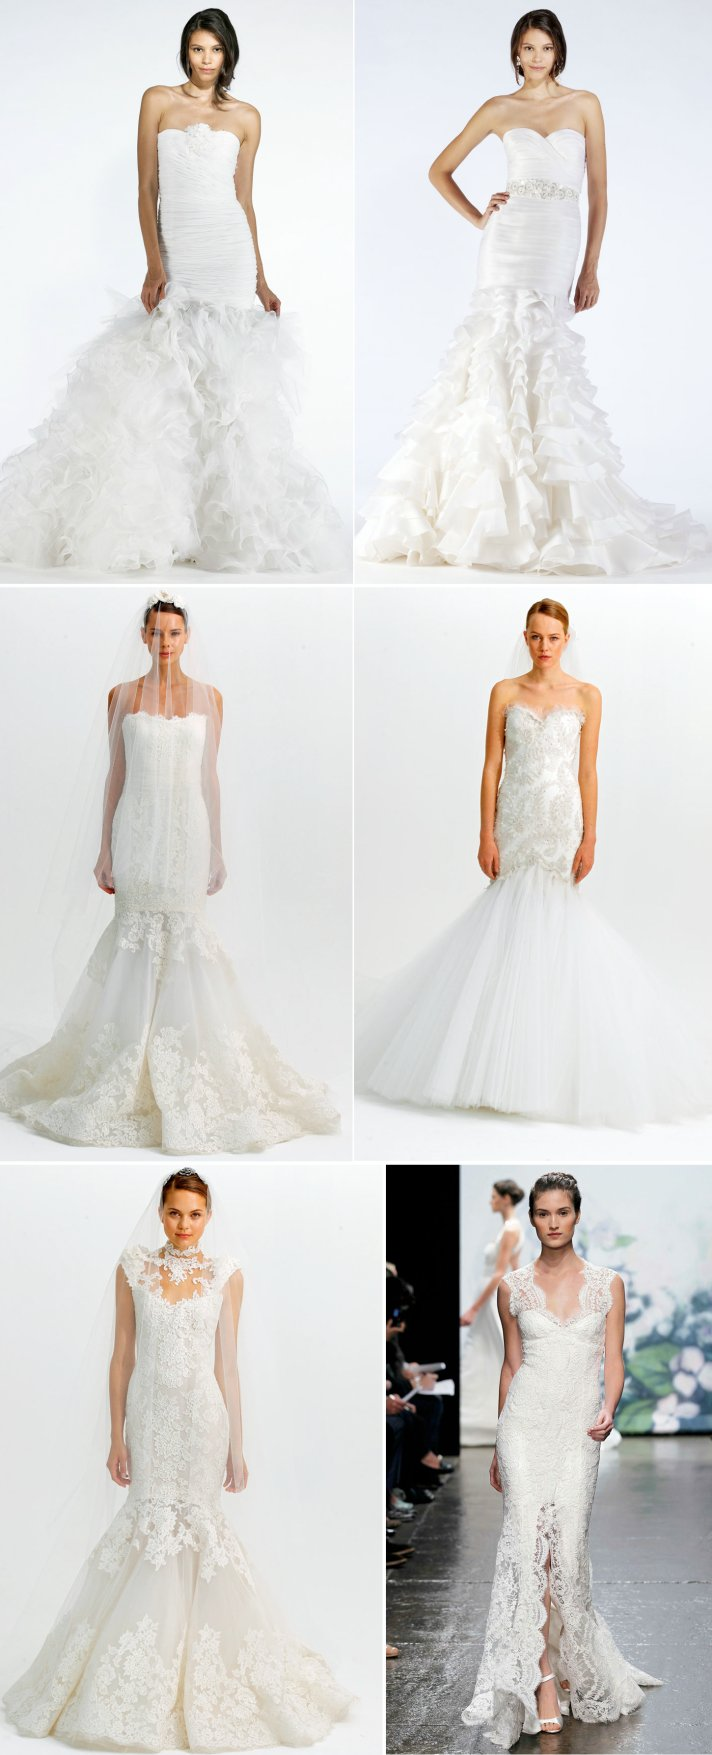 2012 wedding dresses mermaid bridal gown monique lhuillier marchesa oscar de la renta